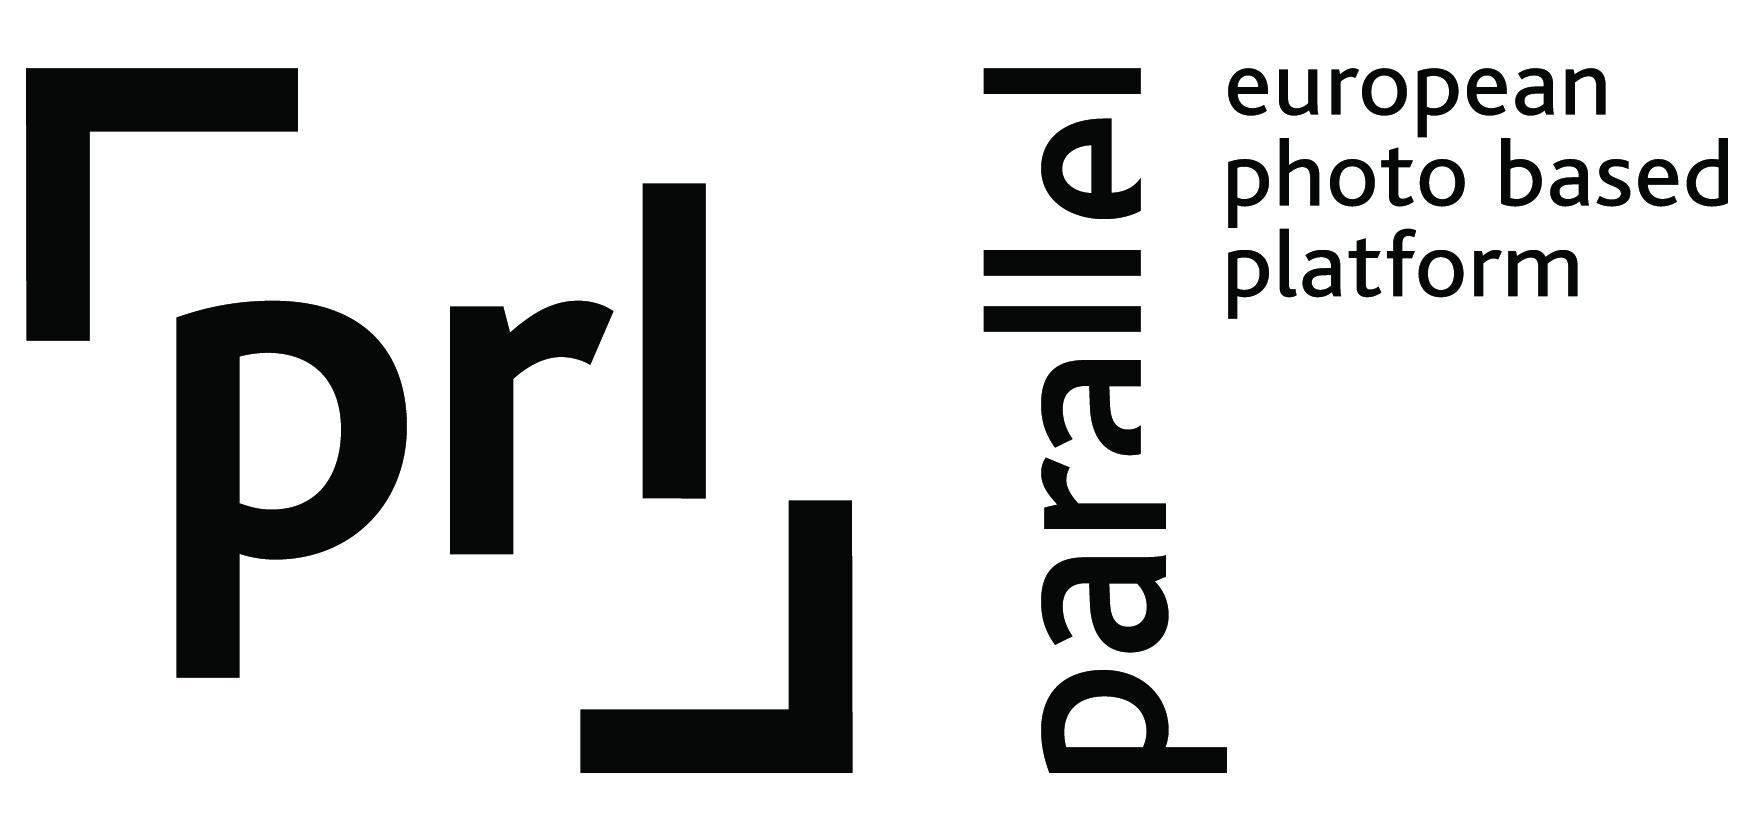 Parallel European Photo Platform